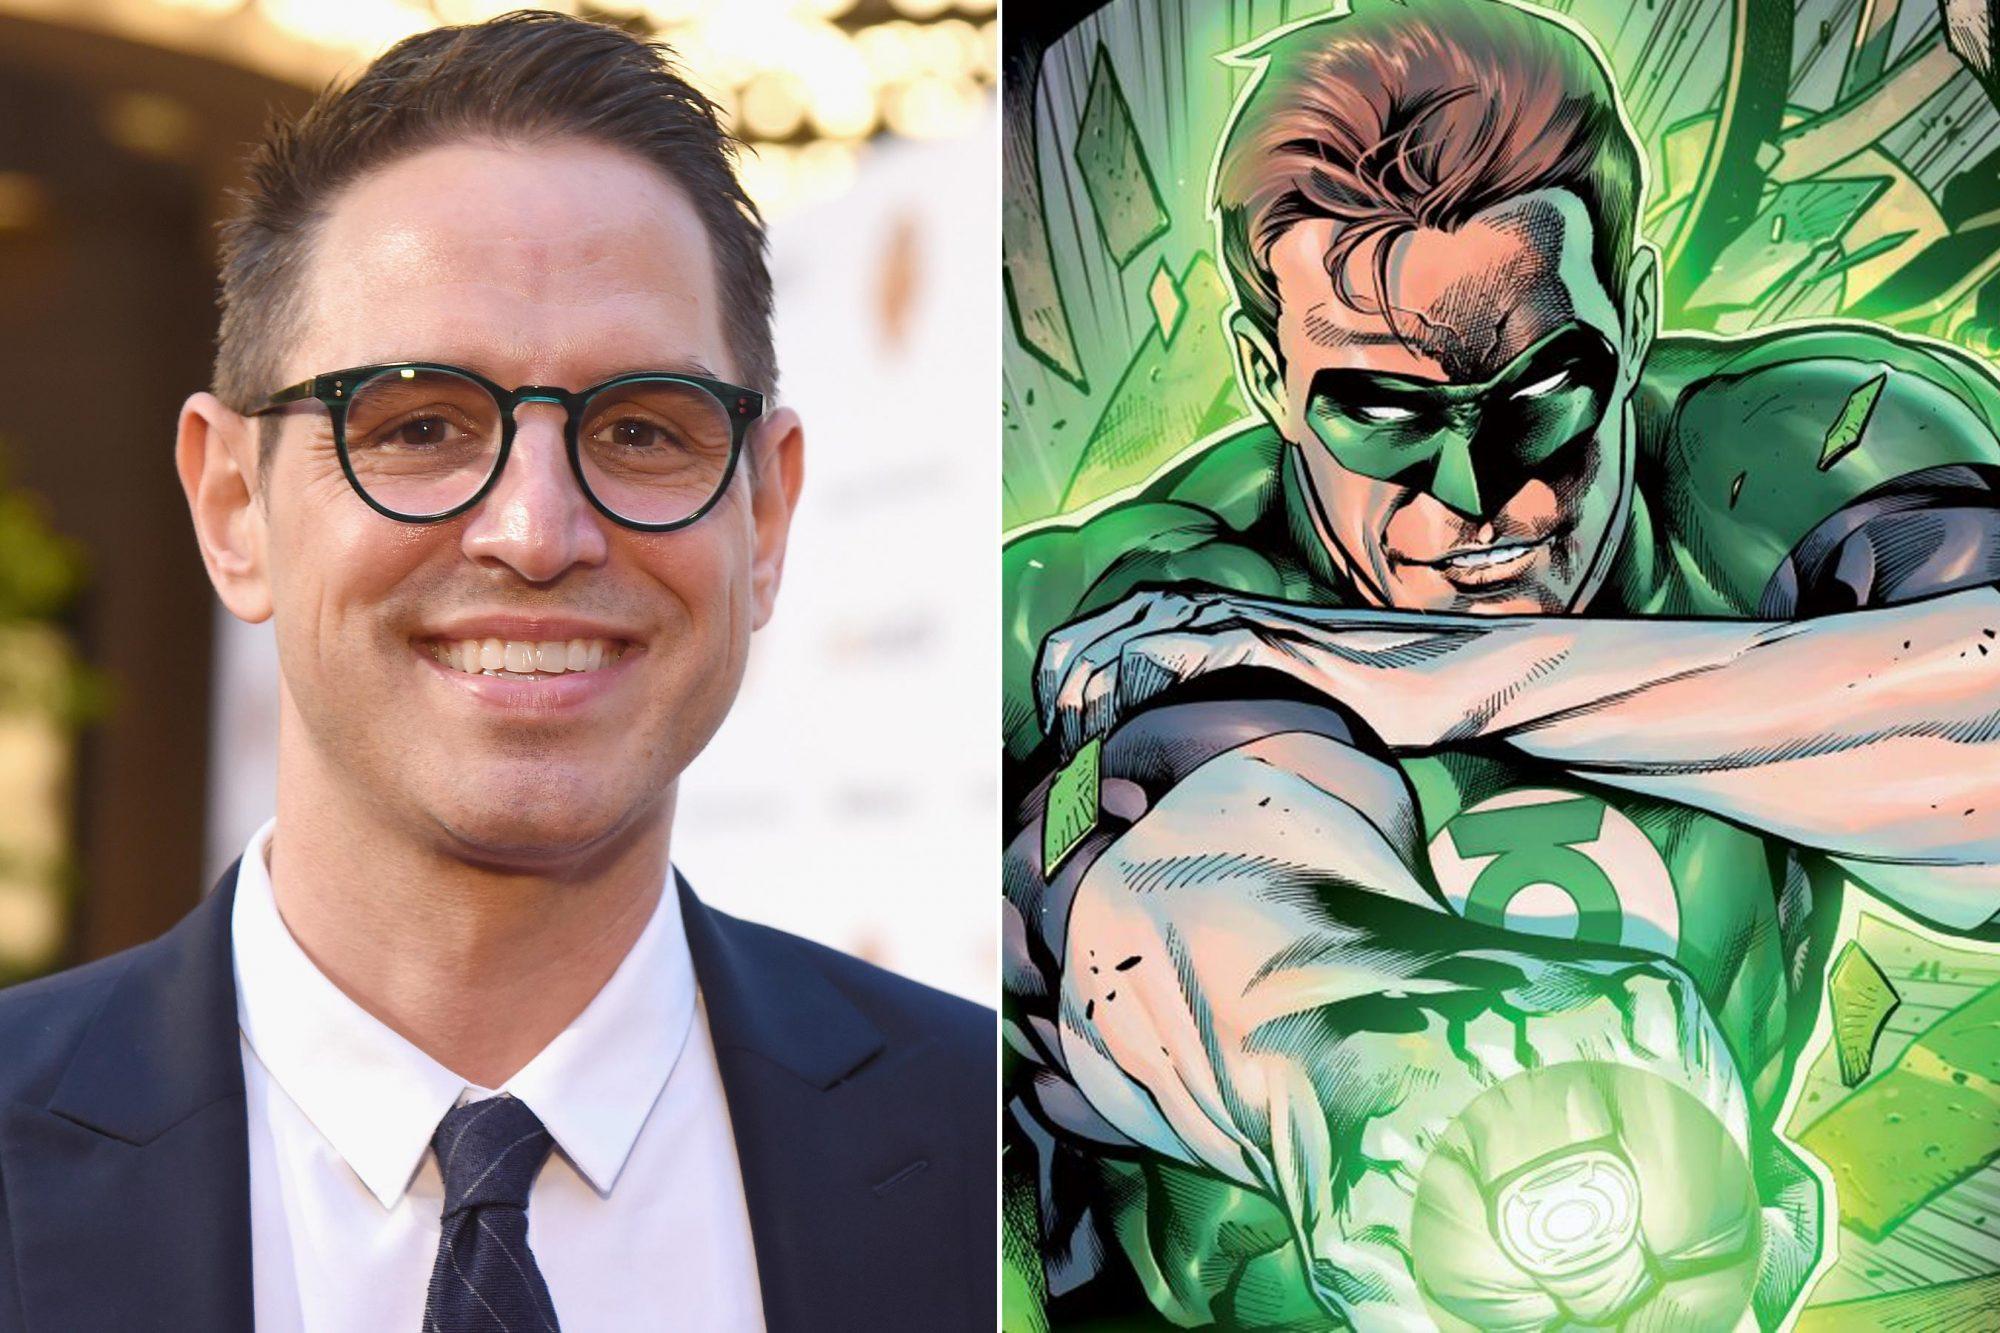 Greg Berlanti, Green Lantern